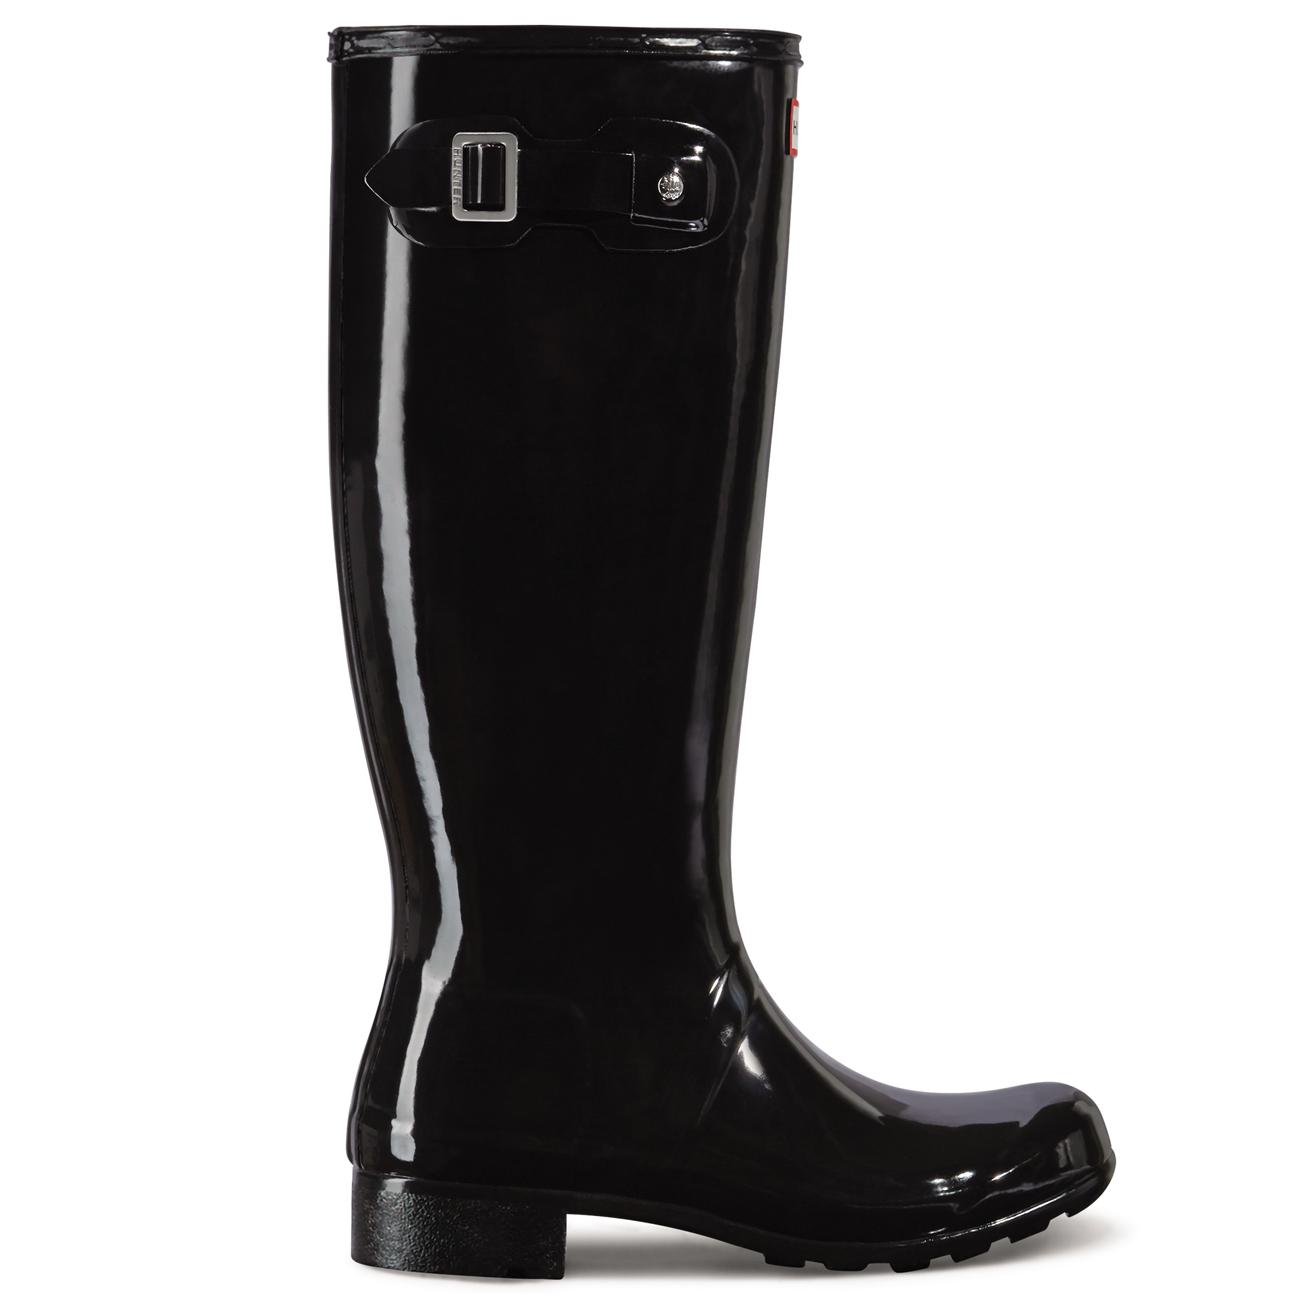 Grandes zapatos con descuento Ladies Hunter Original Tour Gloss Waterproof Festival Snow Rain Boots All Sizes